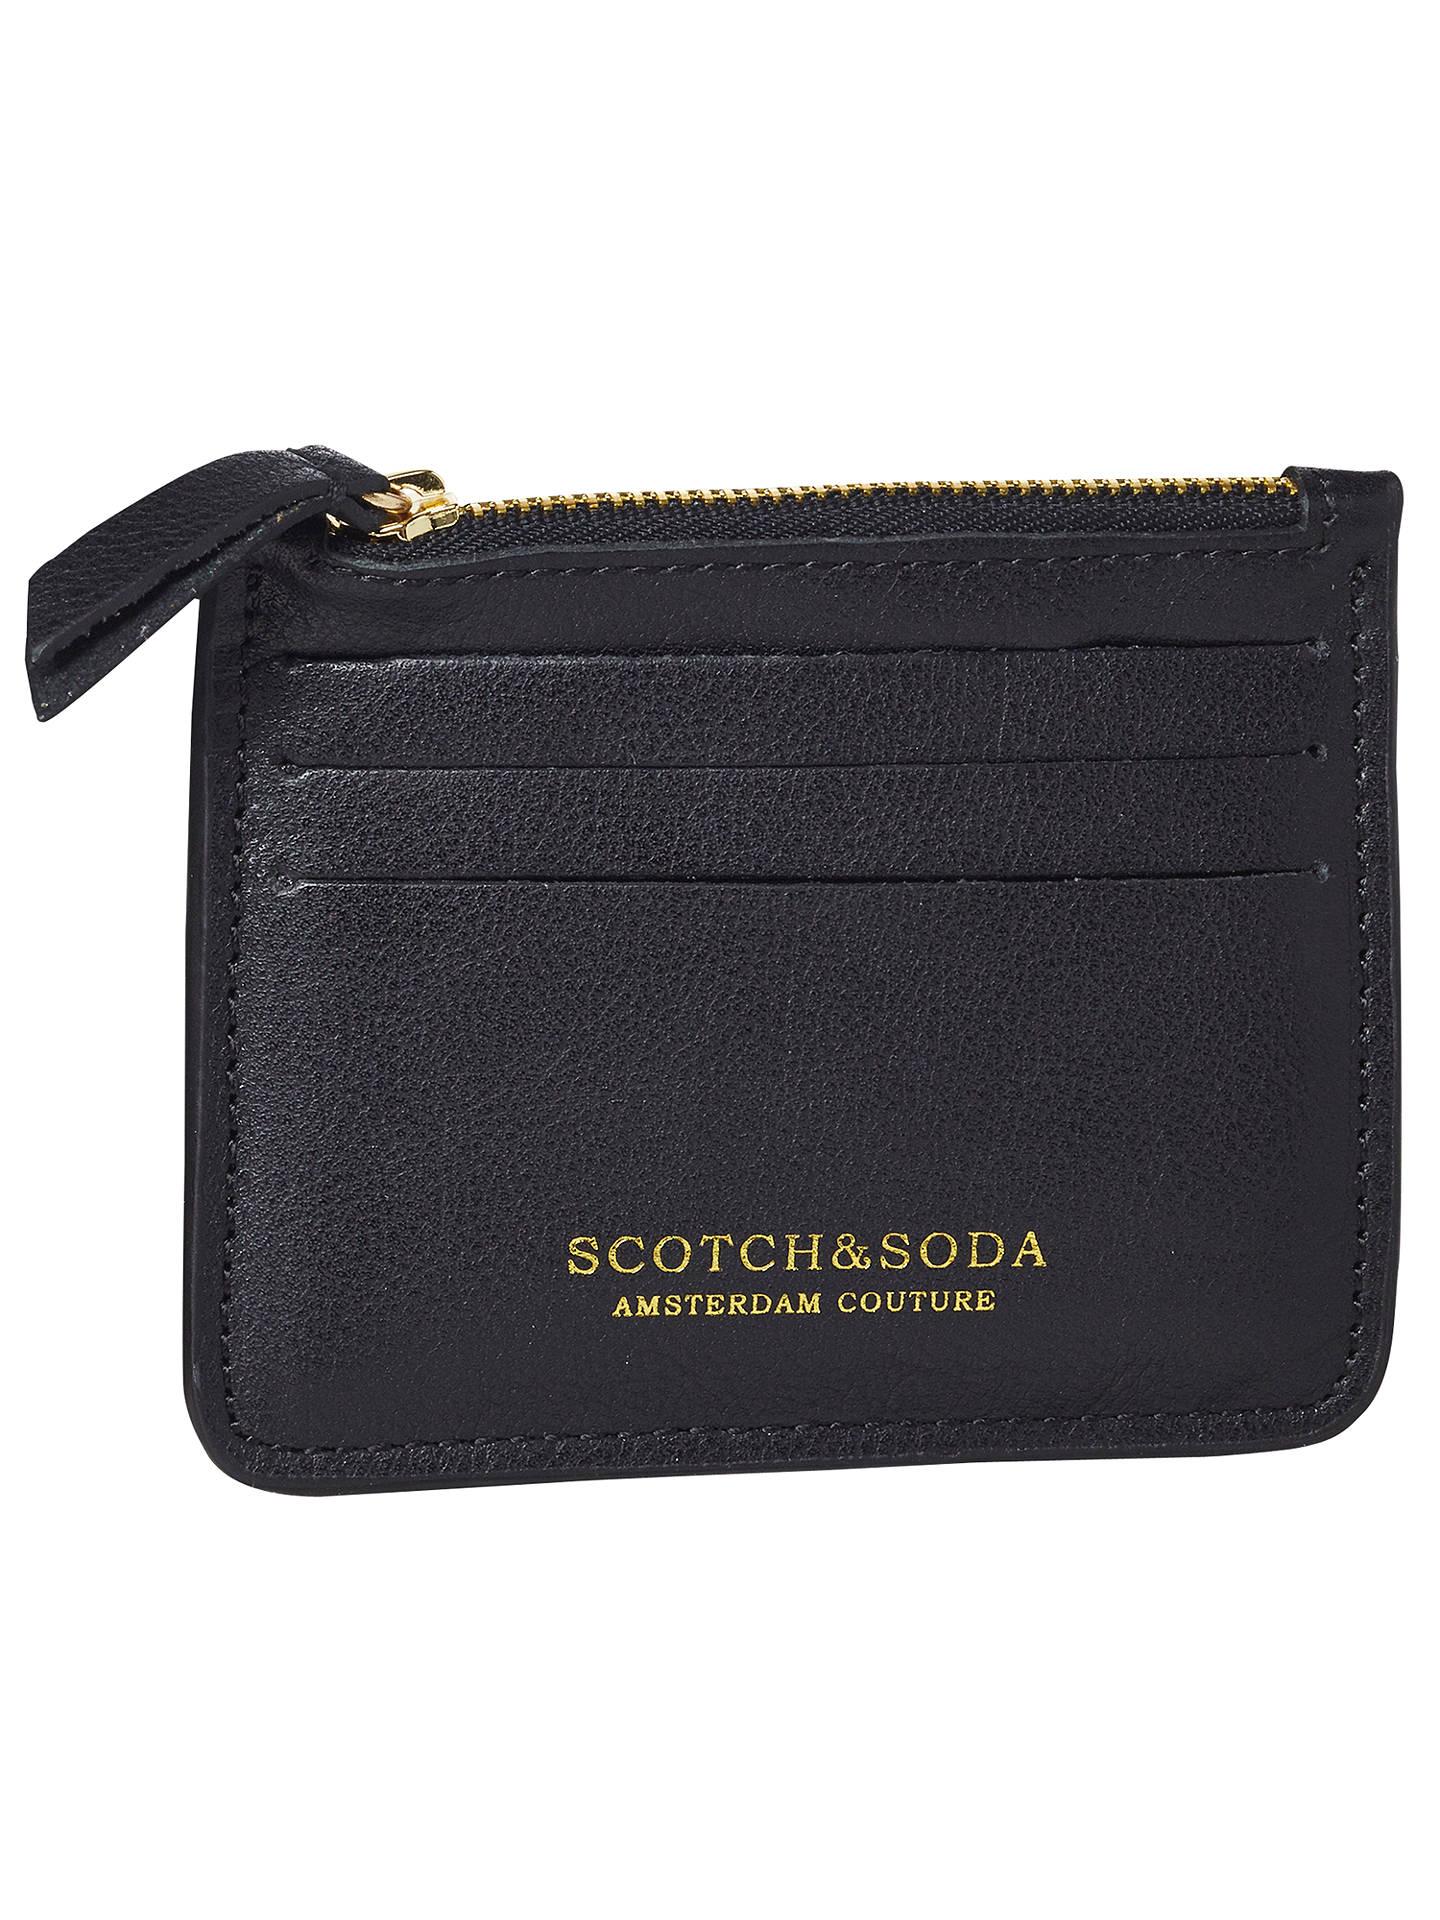 5e27c3928513c2 Scotch   Soda Leather Credit Card Holder at John Lewis   Partners